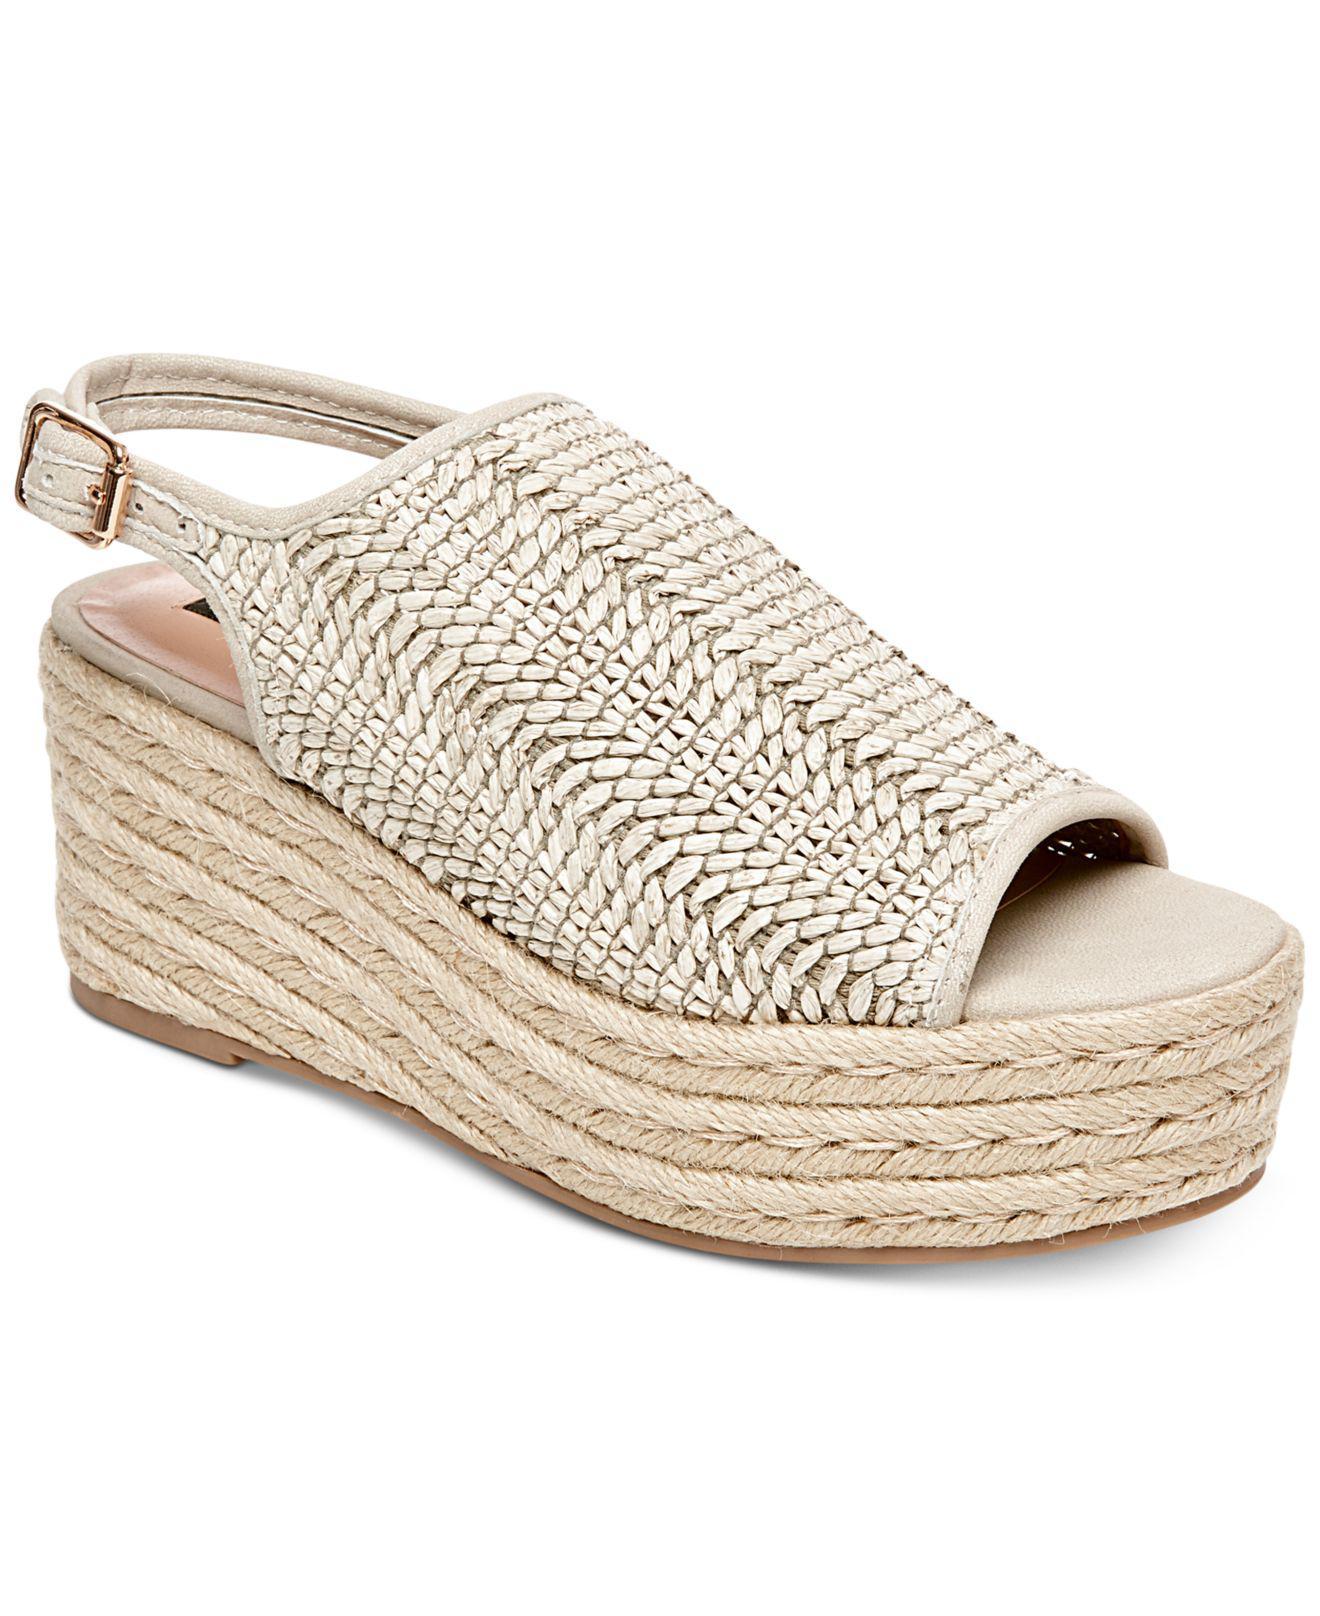 b0c3c25b3bb Women's Natural Courage Espadrille Wedge Sandals